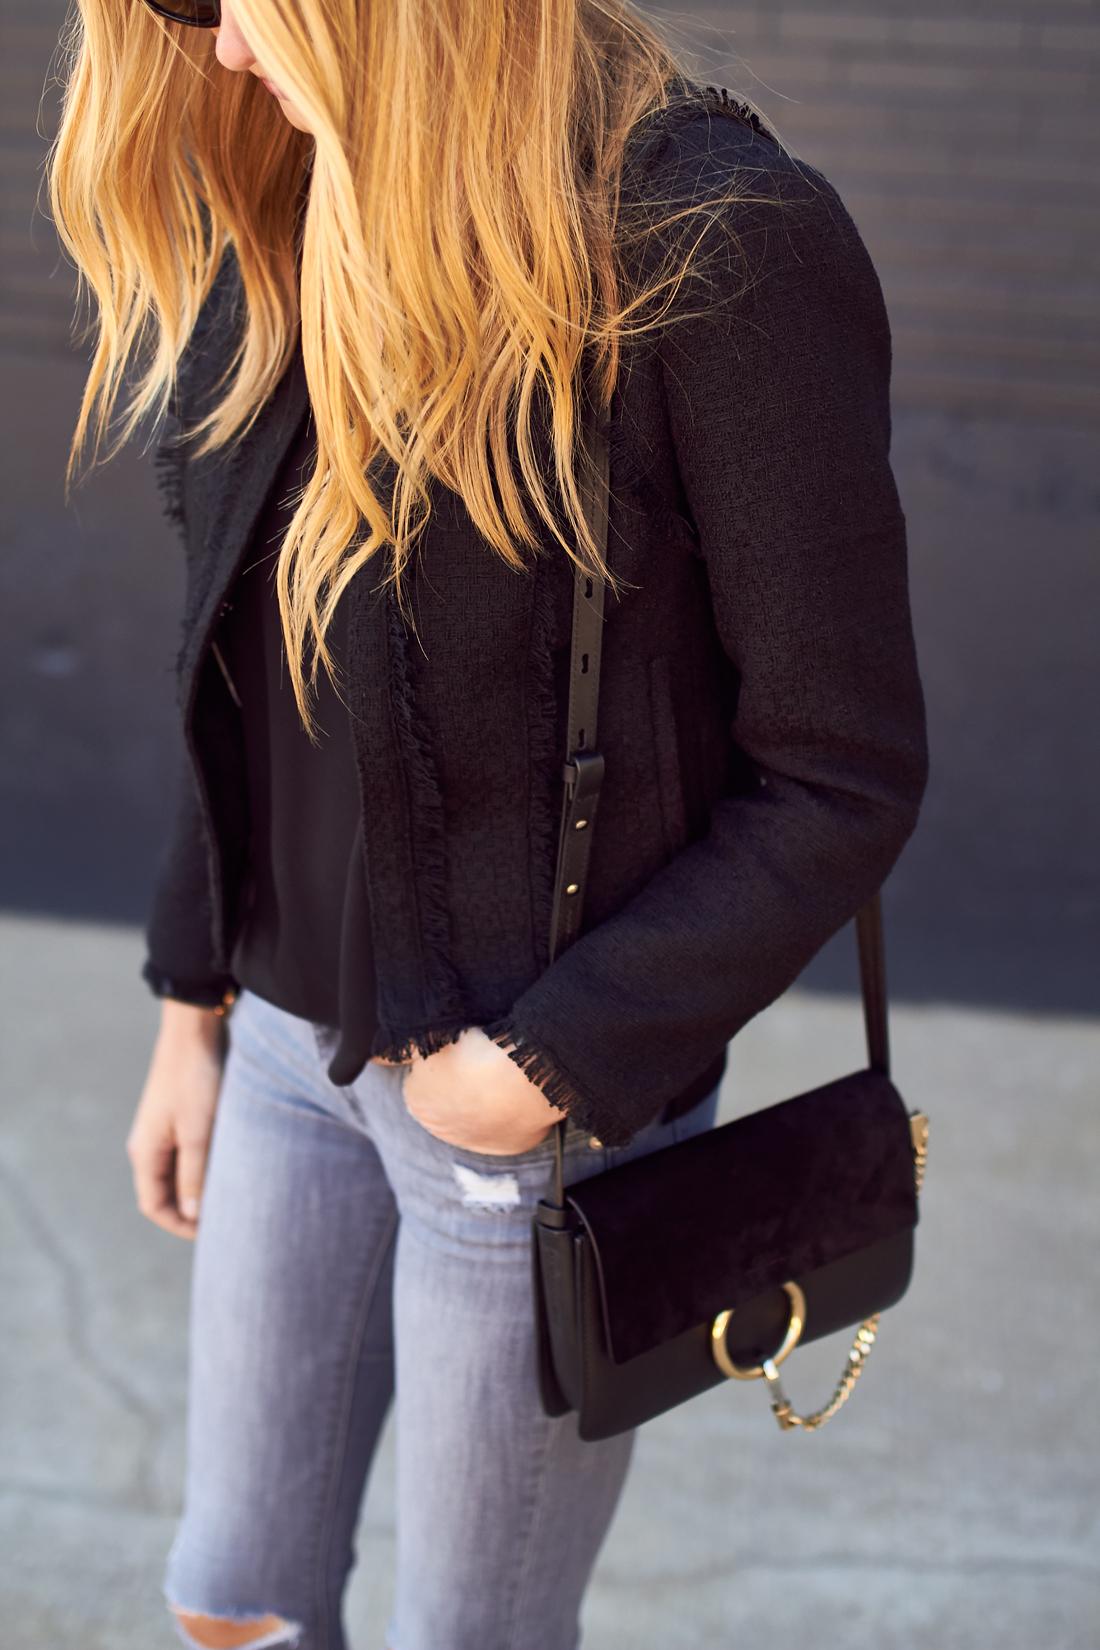 fashion-jackson-black-tweed-jacket-chloe-faye-black-handbag